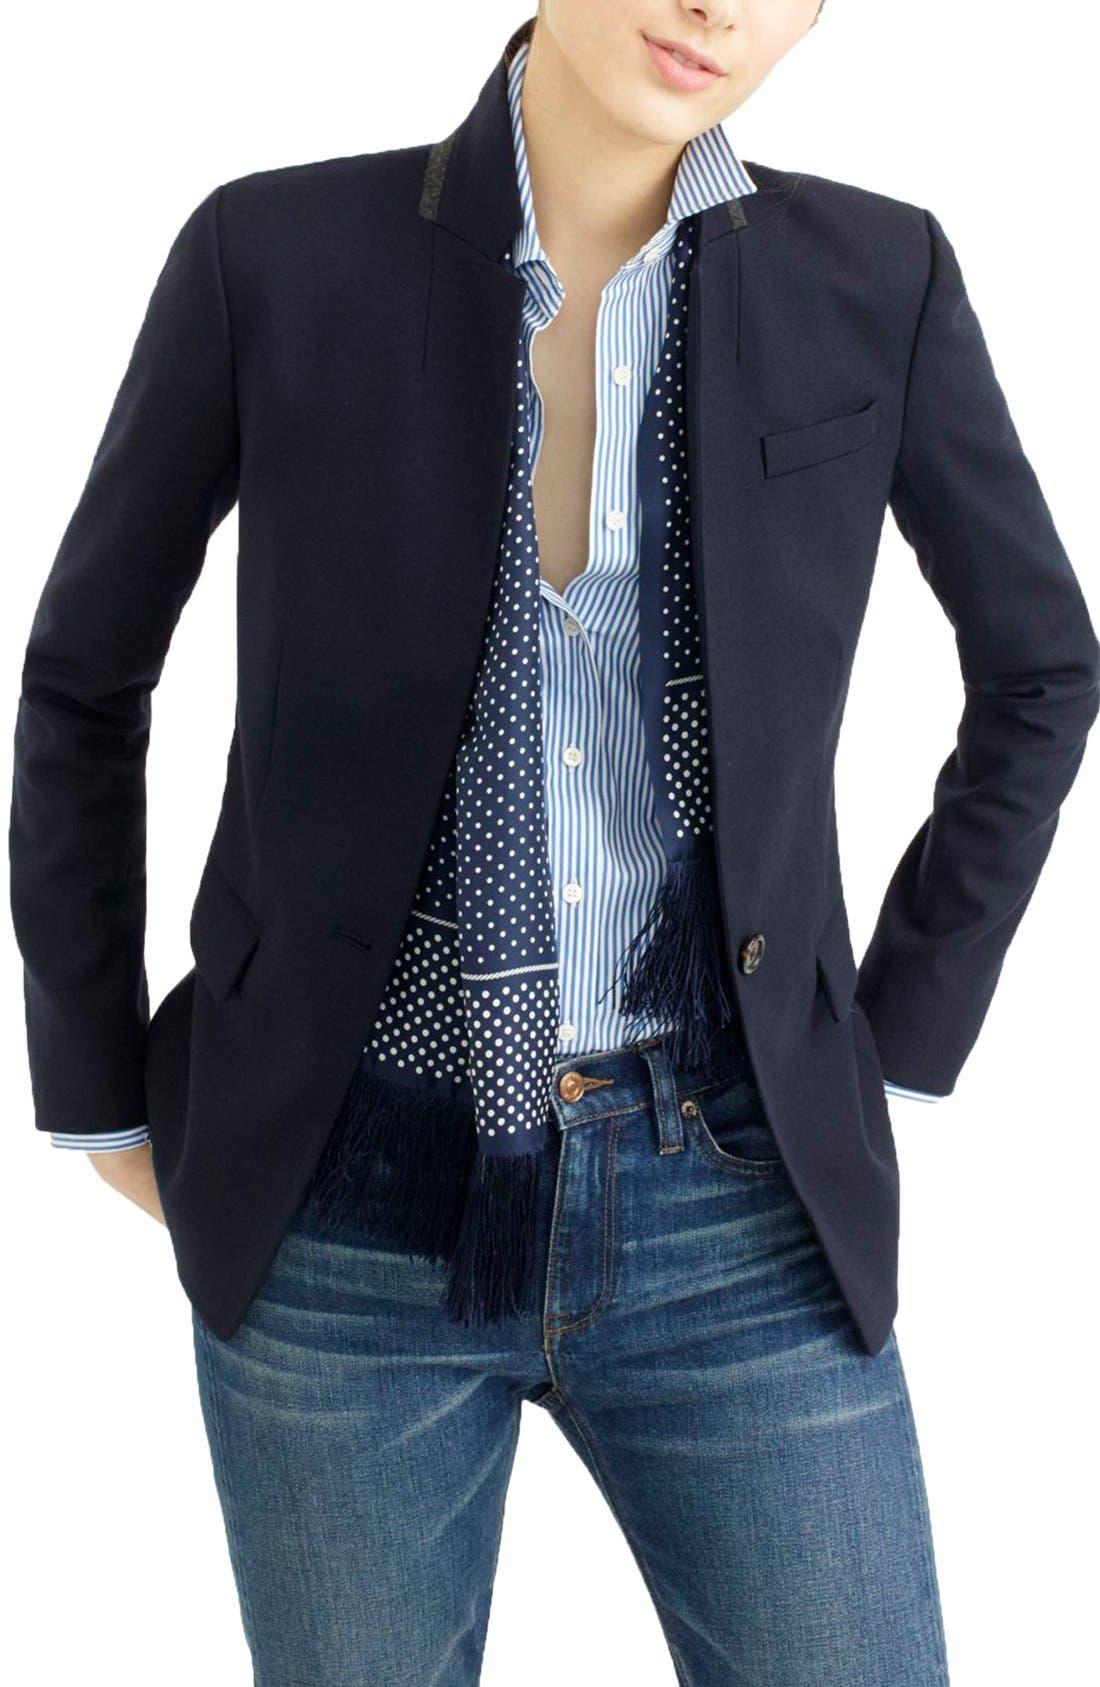 Main Image - J.Crew Regent Stand Collar Blazer (Regular & Petite)